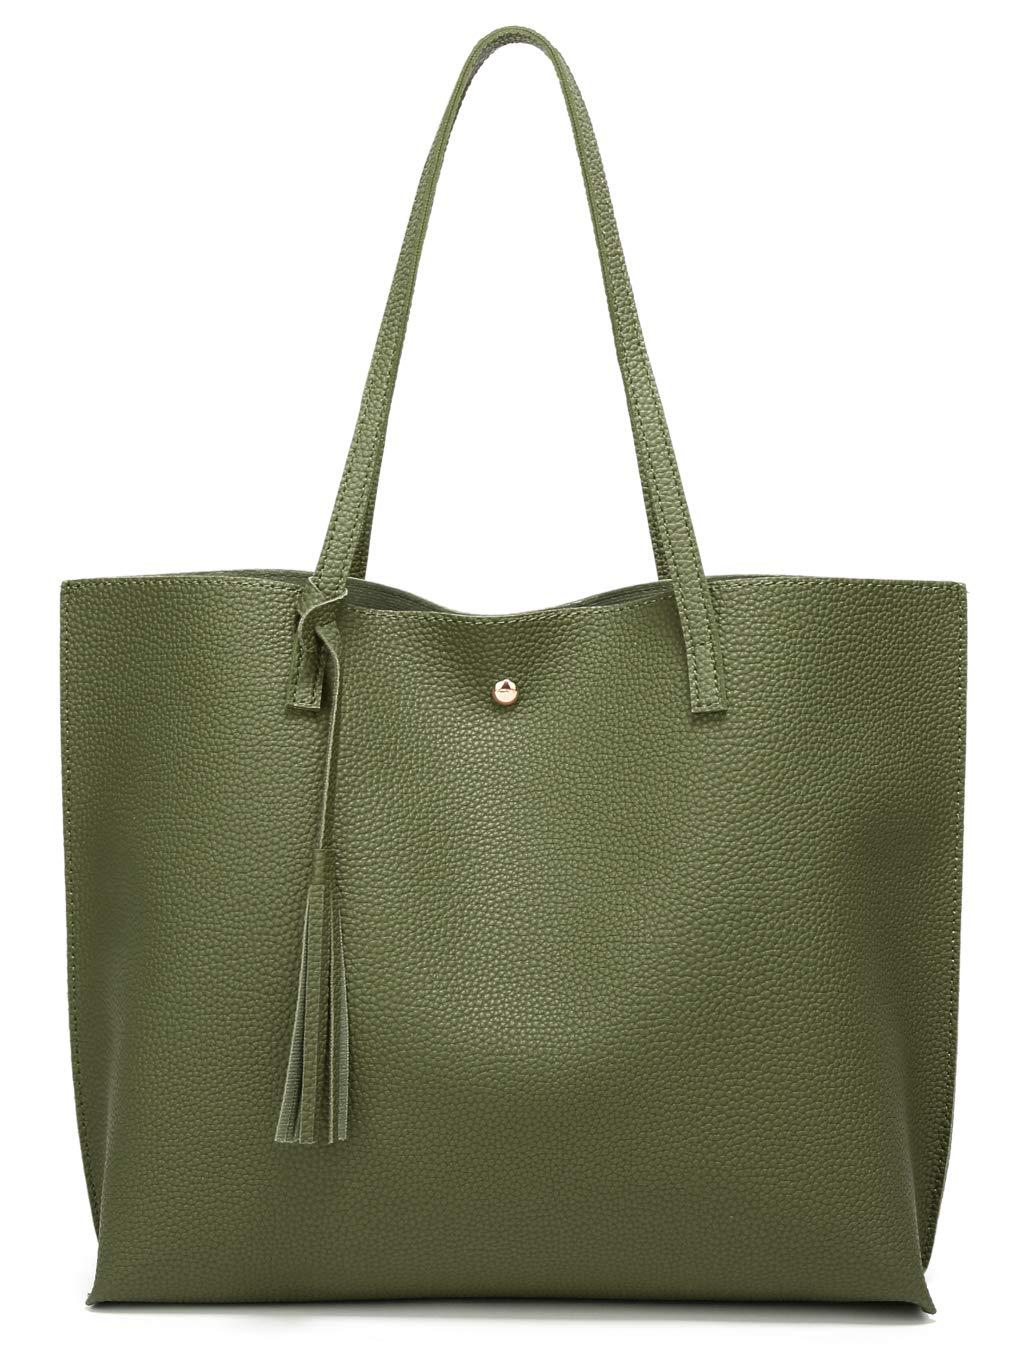 Womans Leather Tote Bag Orange Elephant Soft Capacity Shoulder Handbag